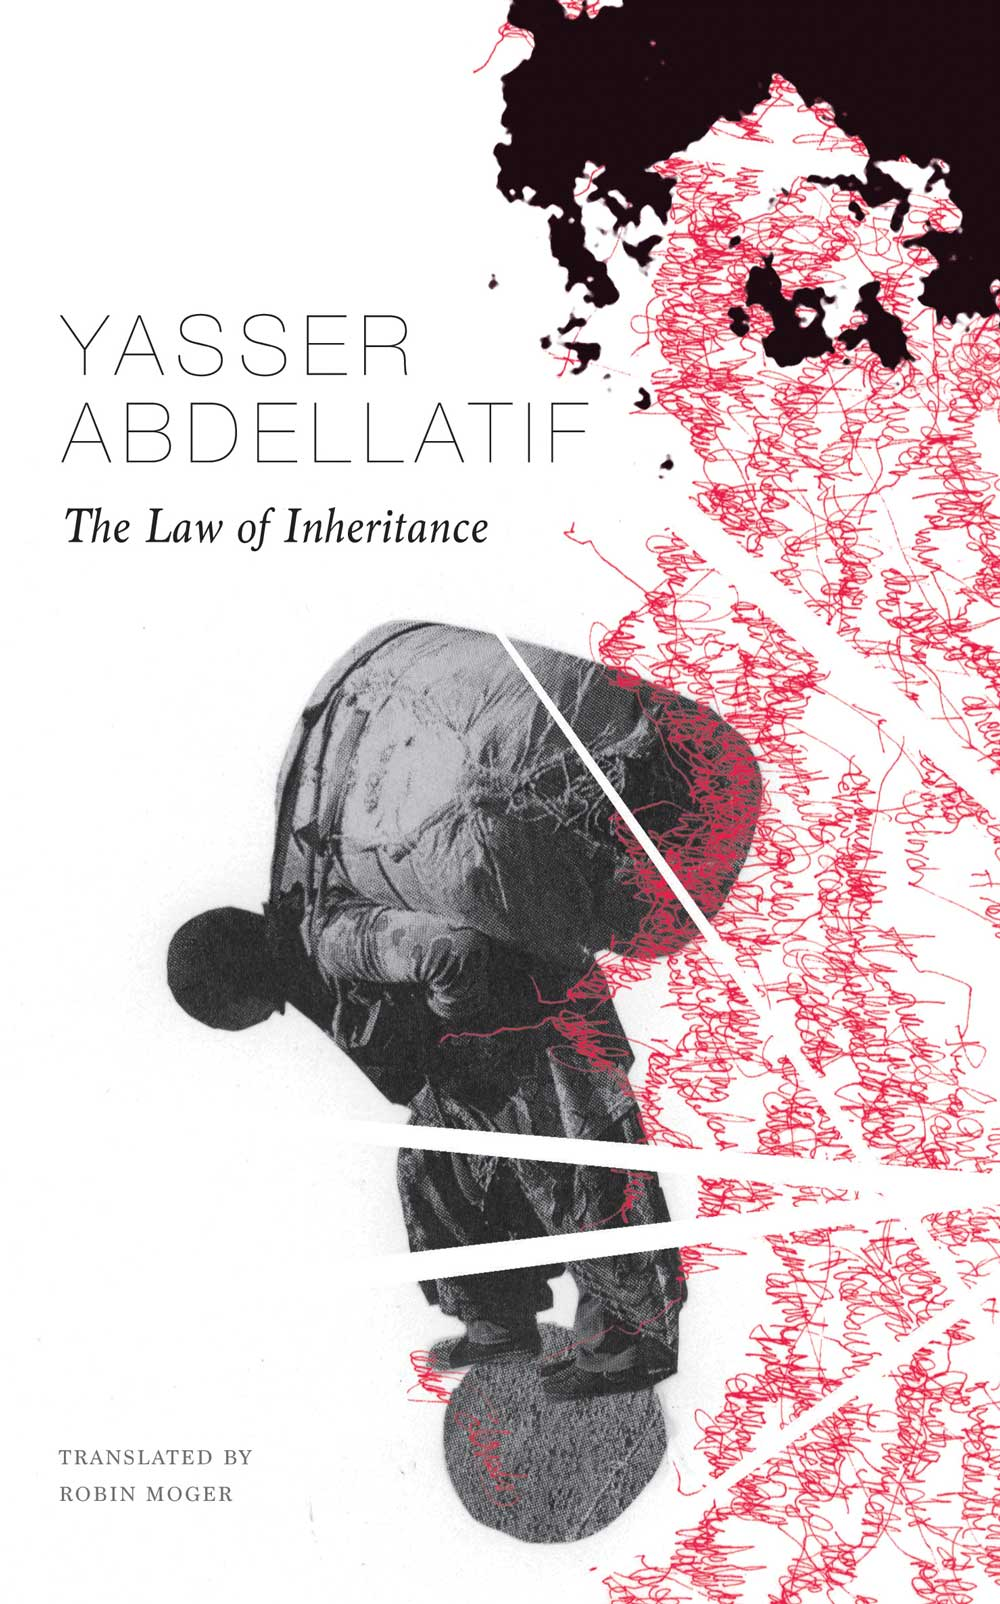 The Law of Inheritance by Yasser Abdellatif  |  Seagull Books